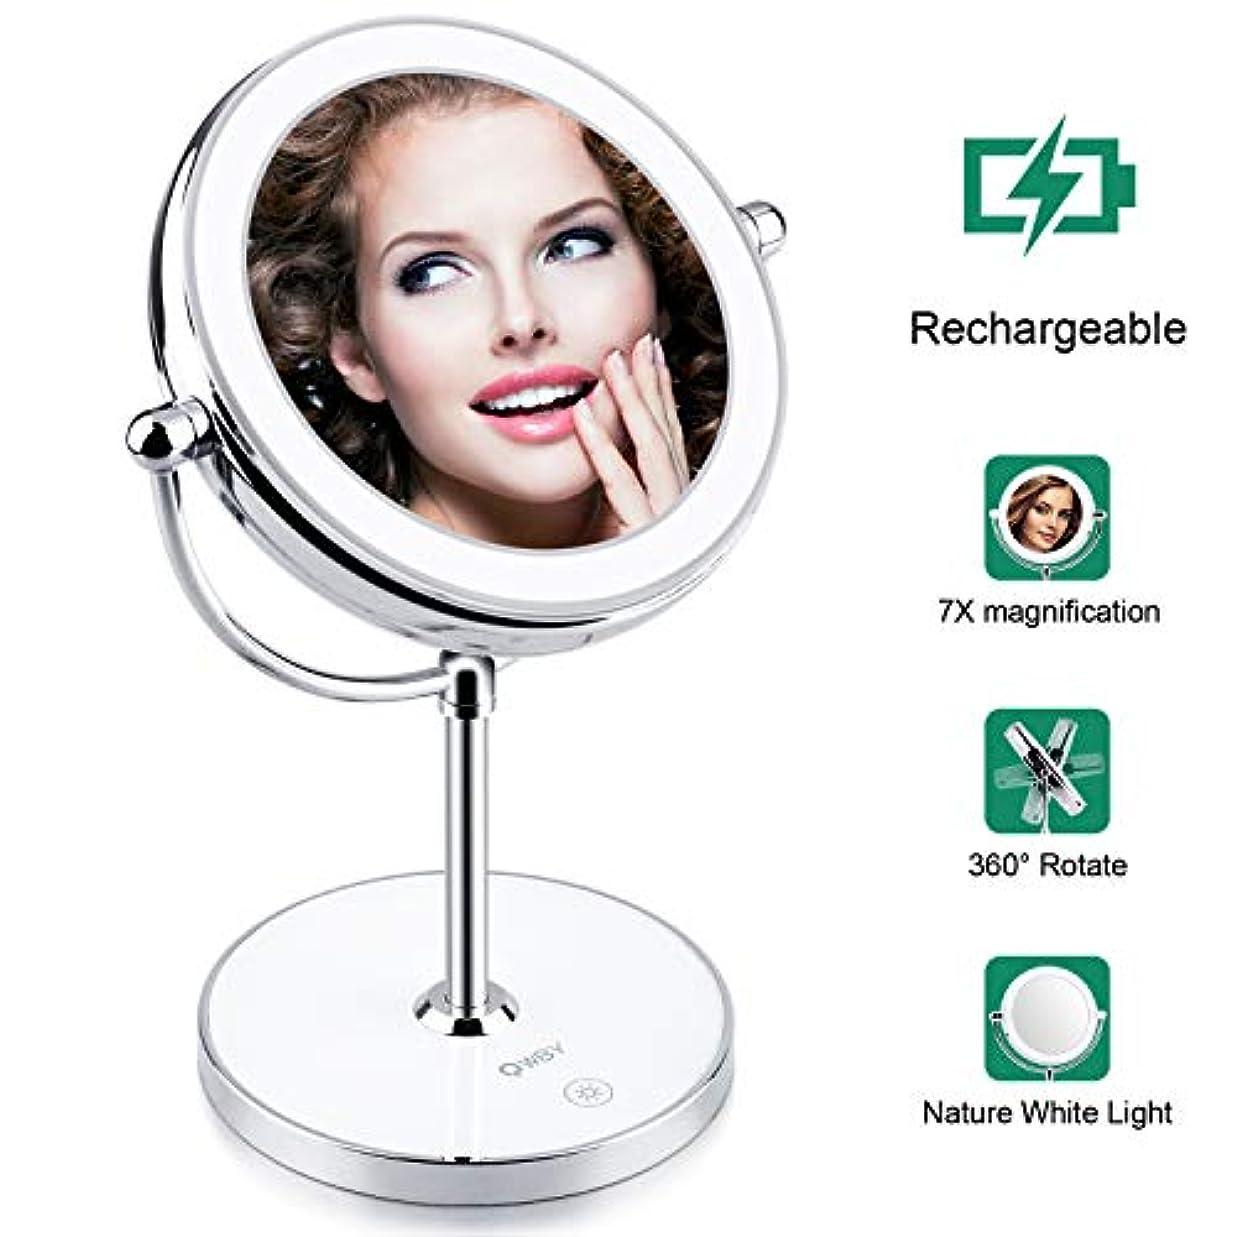 World Backyard 内蔵 充電式電池とライトで丸い形状 コードレスミラーを適用する美容化粧品 用 化粧鏡両面1X倍率を点灯。 7X